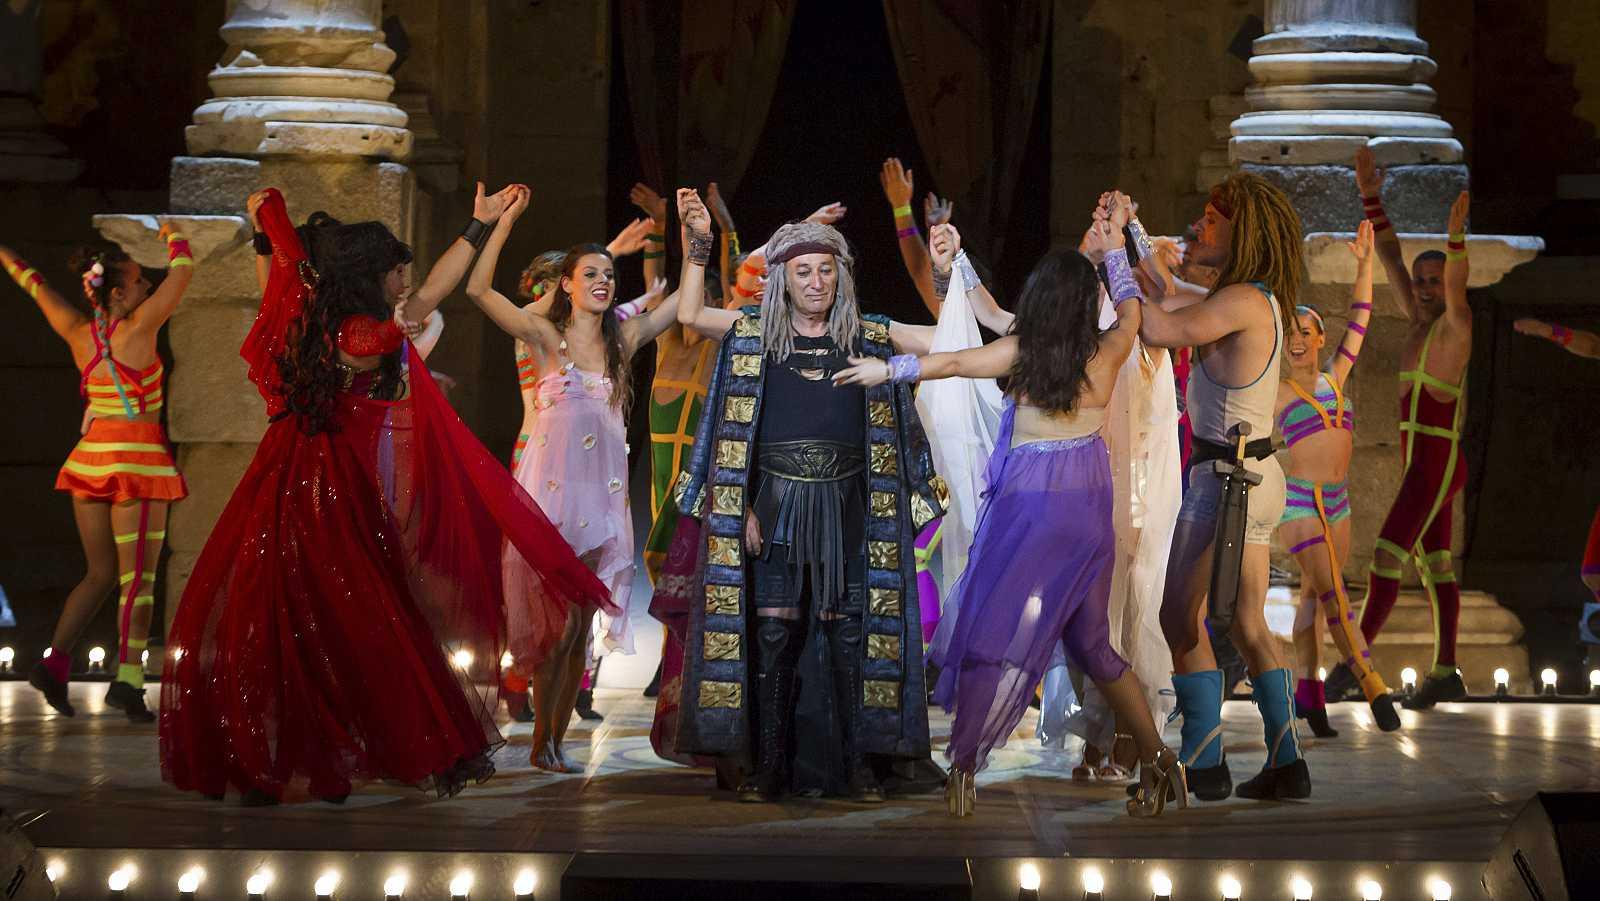 Las mañanas de RNE - Pablo Abraira triunfa en Mérida con un musical sobre Hércules - Escuchar ahora